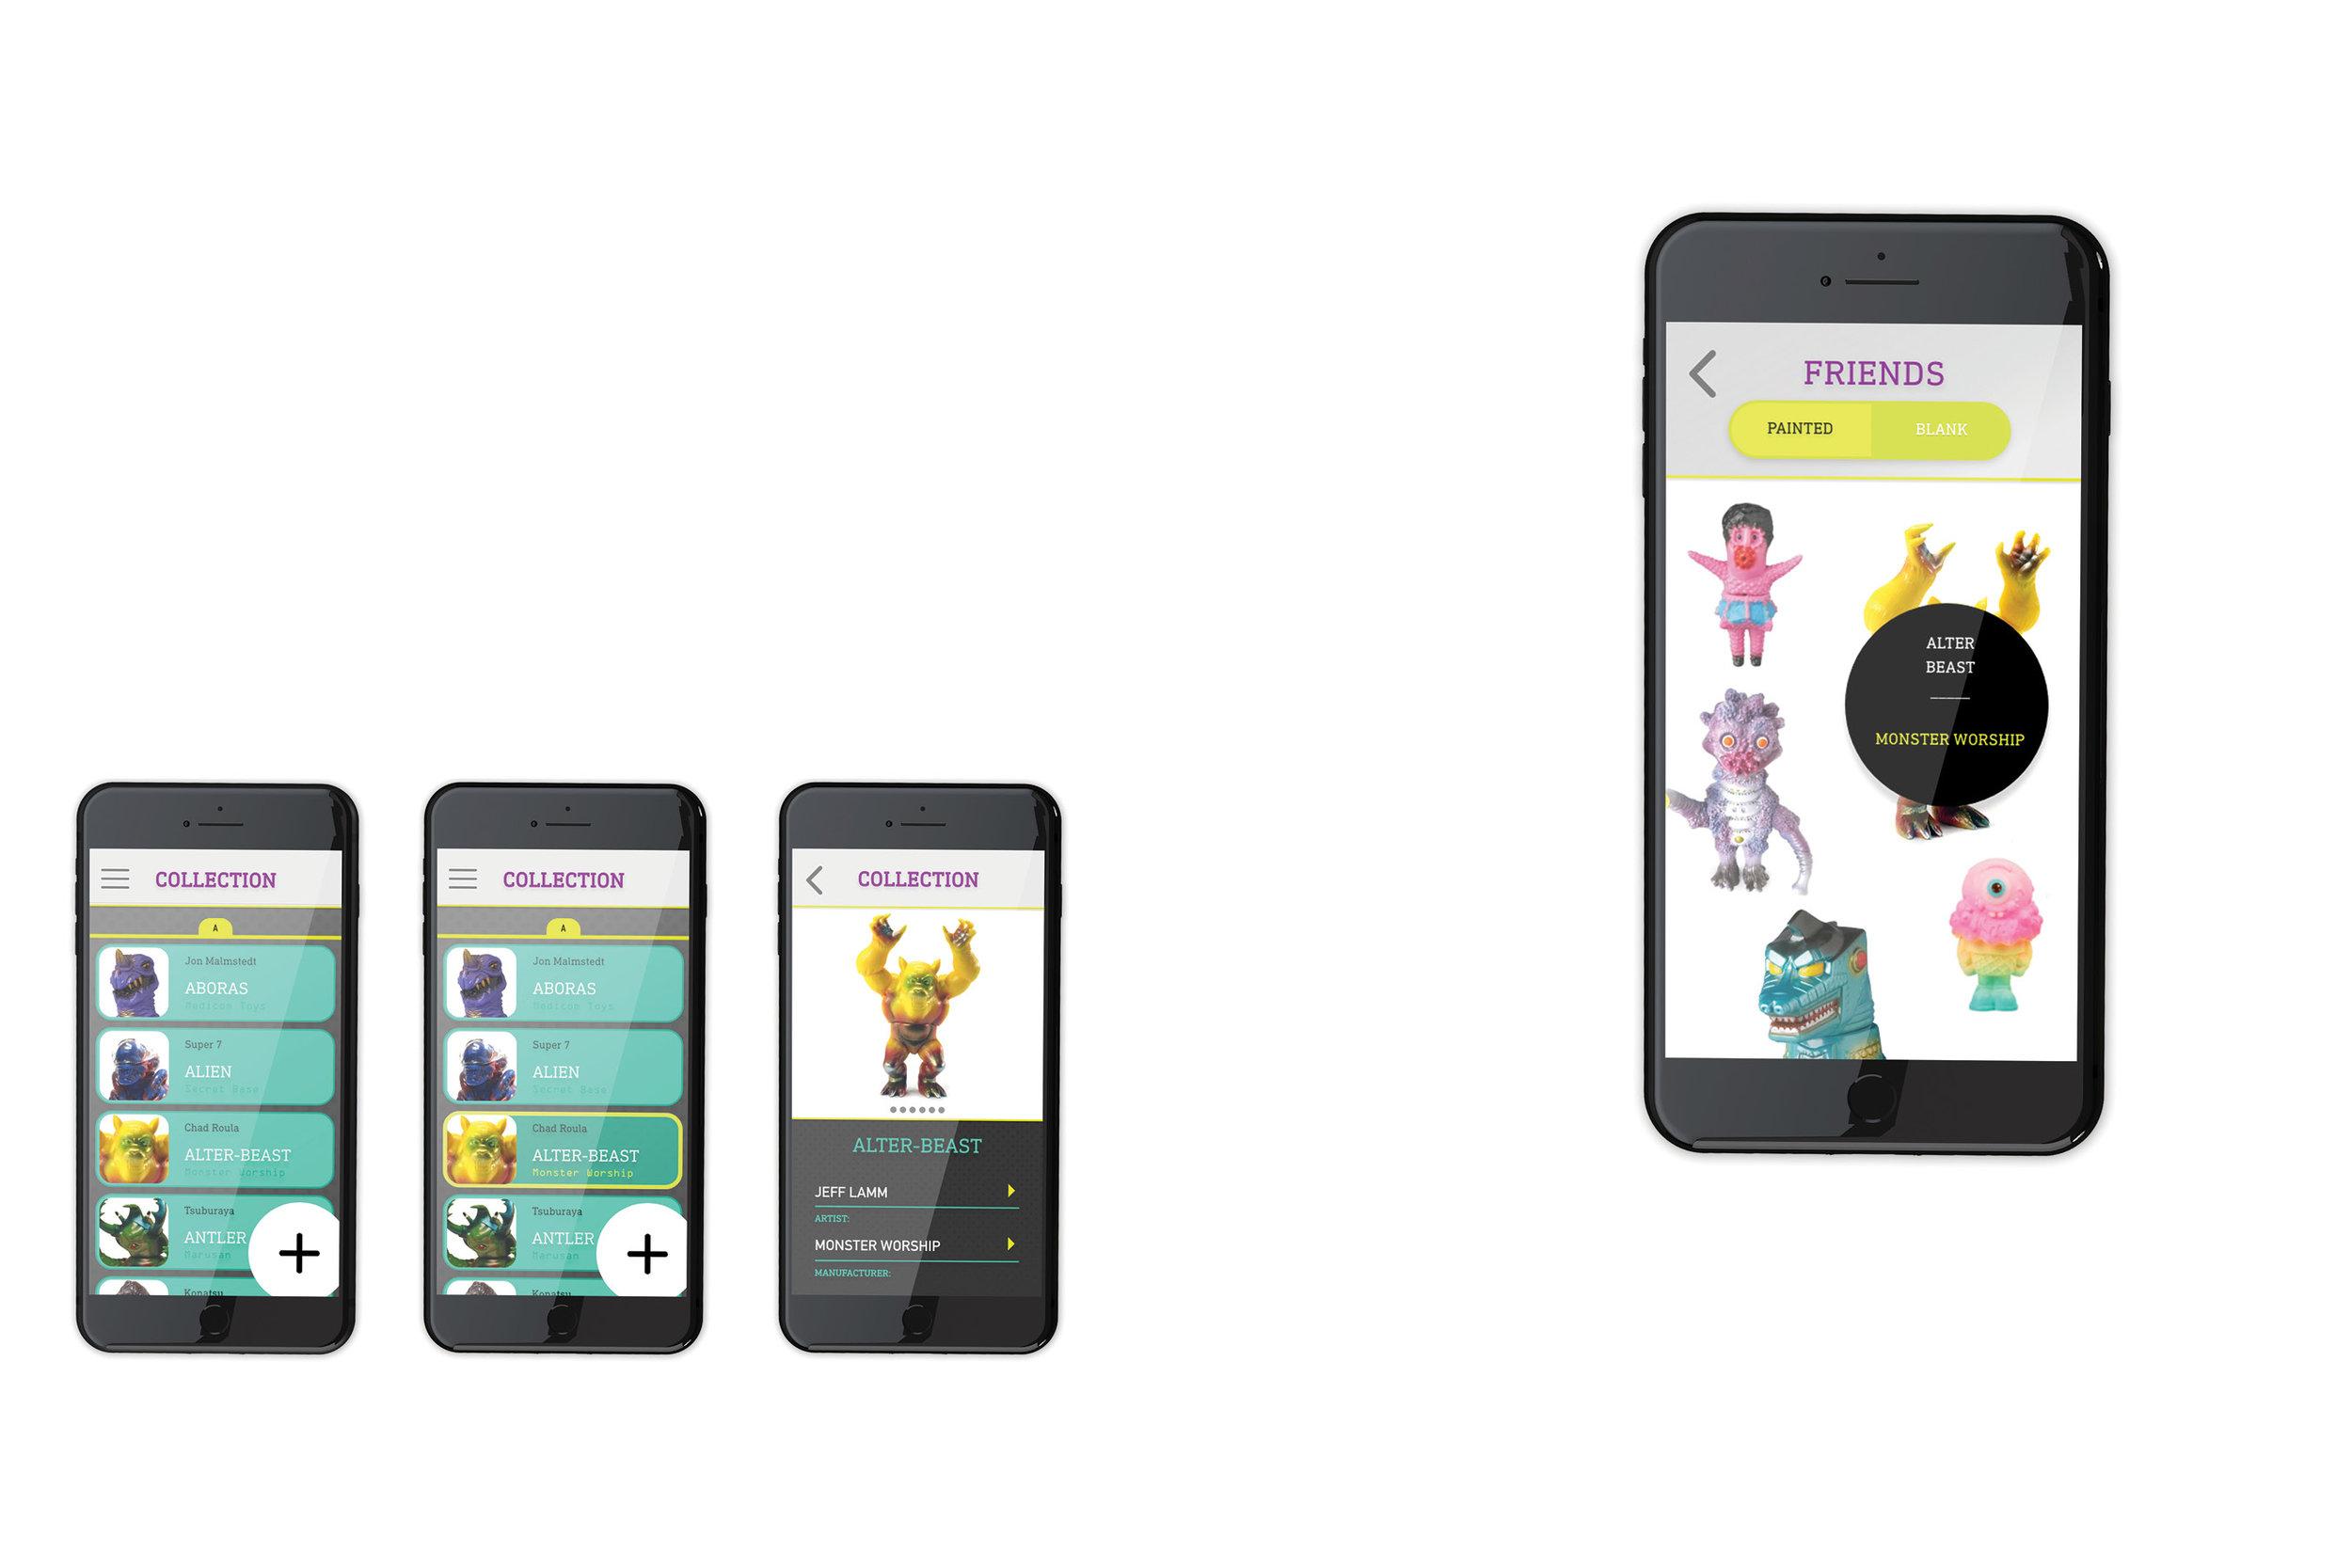 phone_app7.jpg